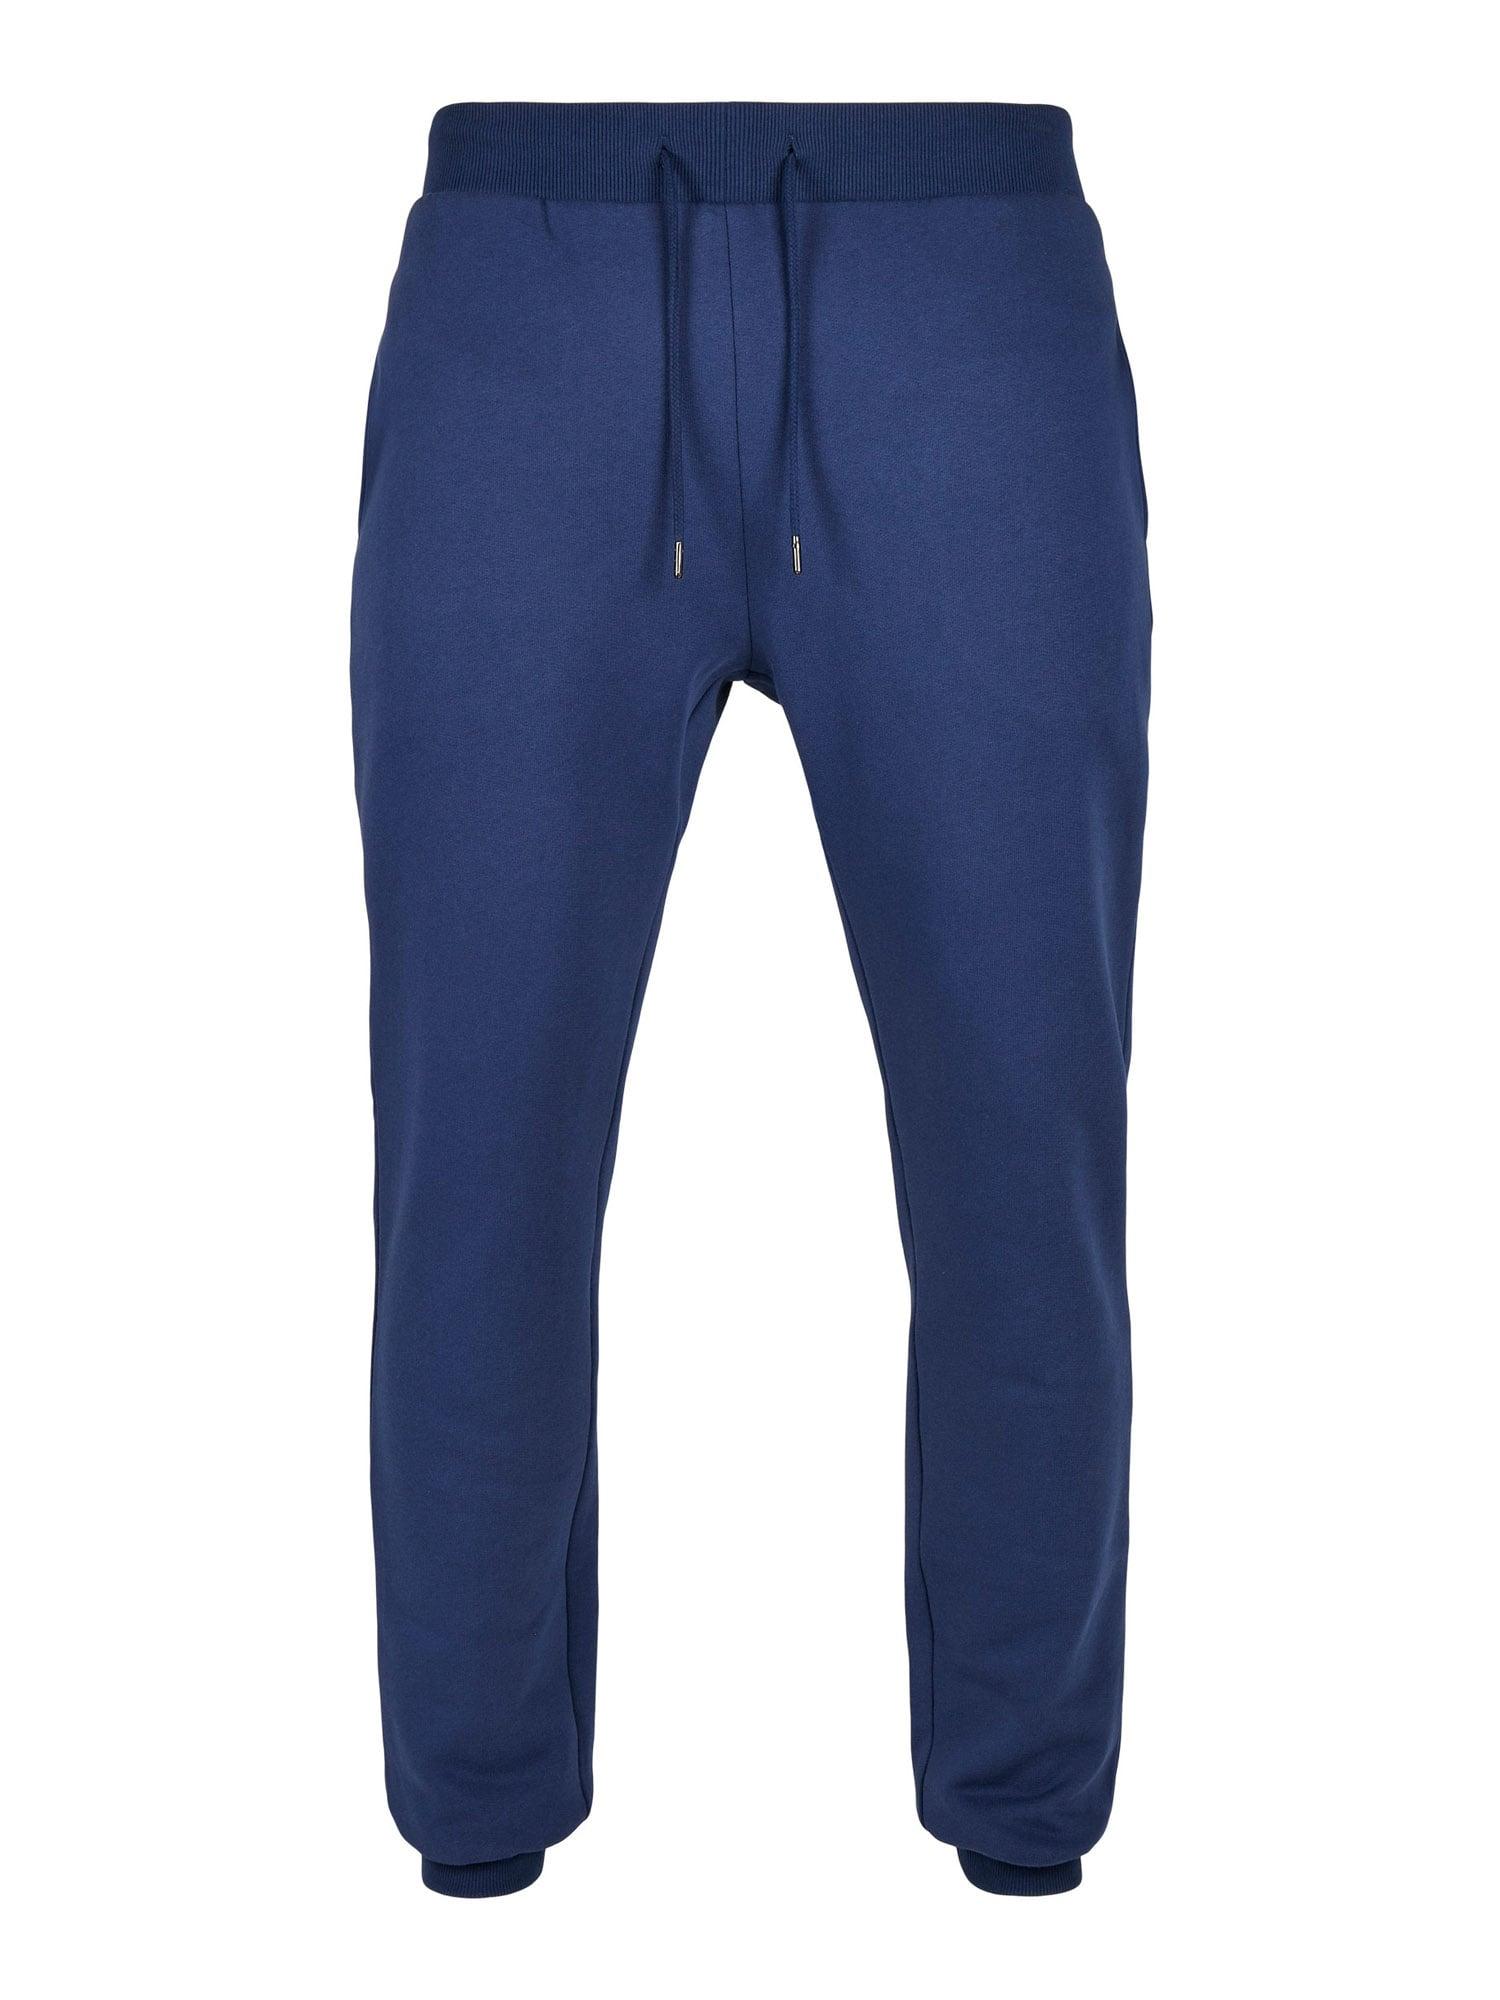 Urban Classics Big & Tall Kelnės tamsiai mėlyna / tamsiai mėlyna